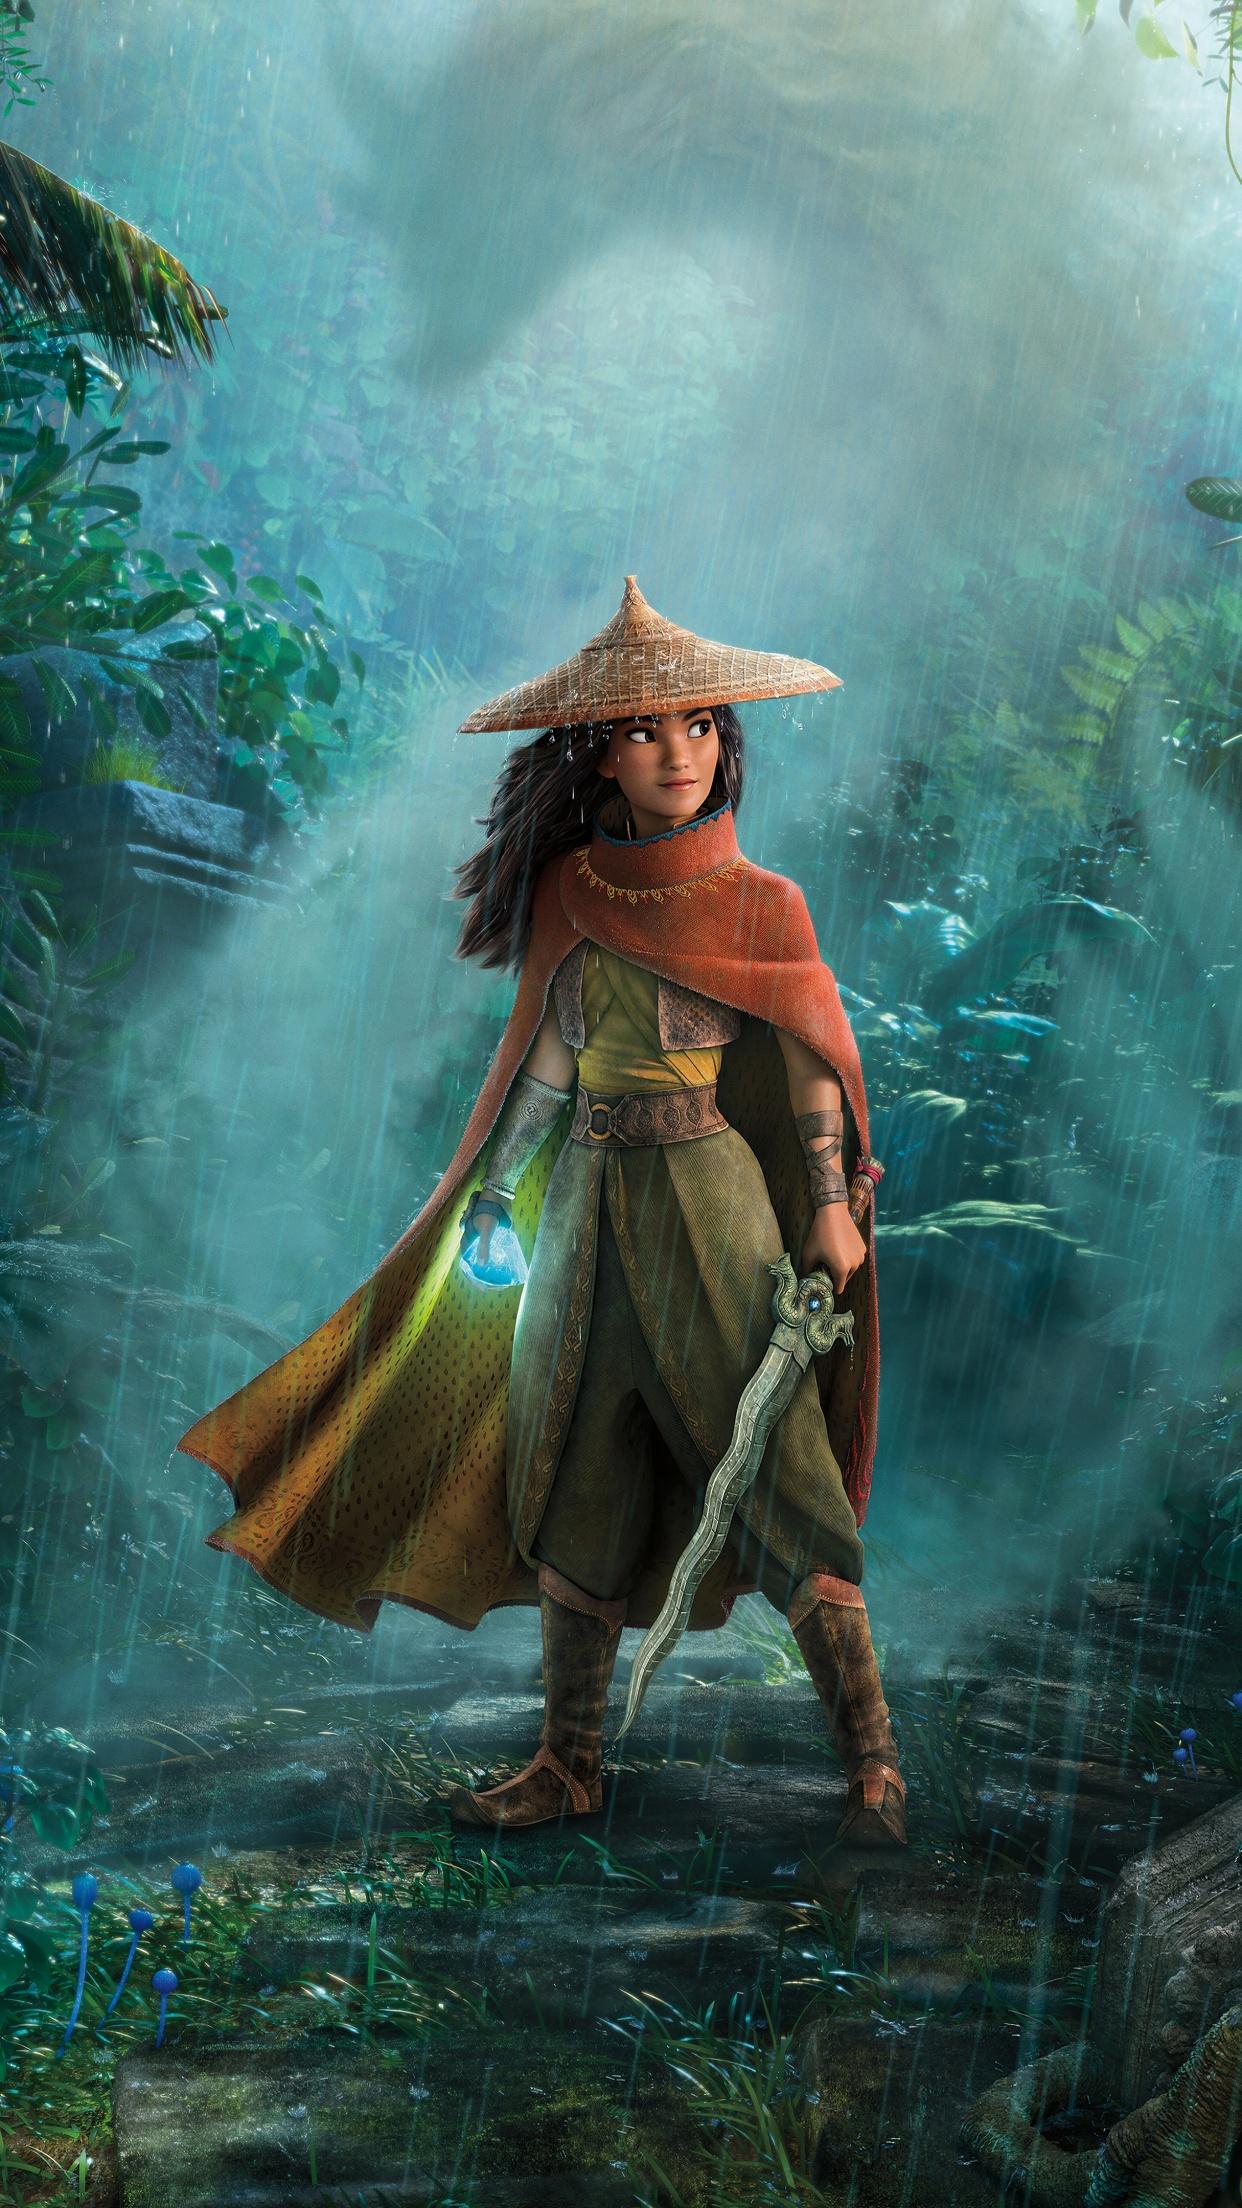 Raya and the Last Dragon 4K Wallpaper, Animation, Adventure, 2021 Movies, Movies, #3794